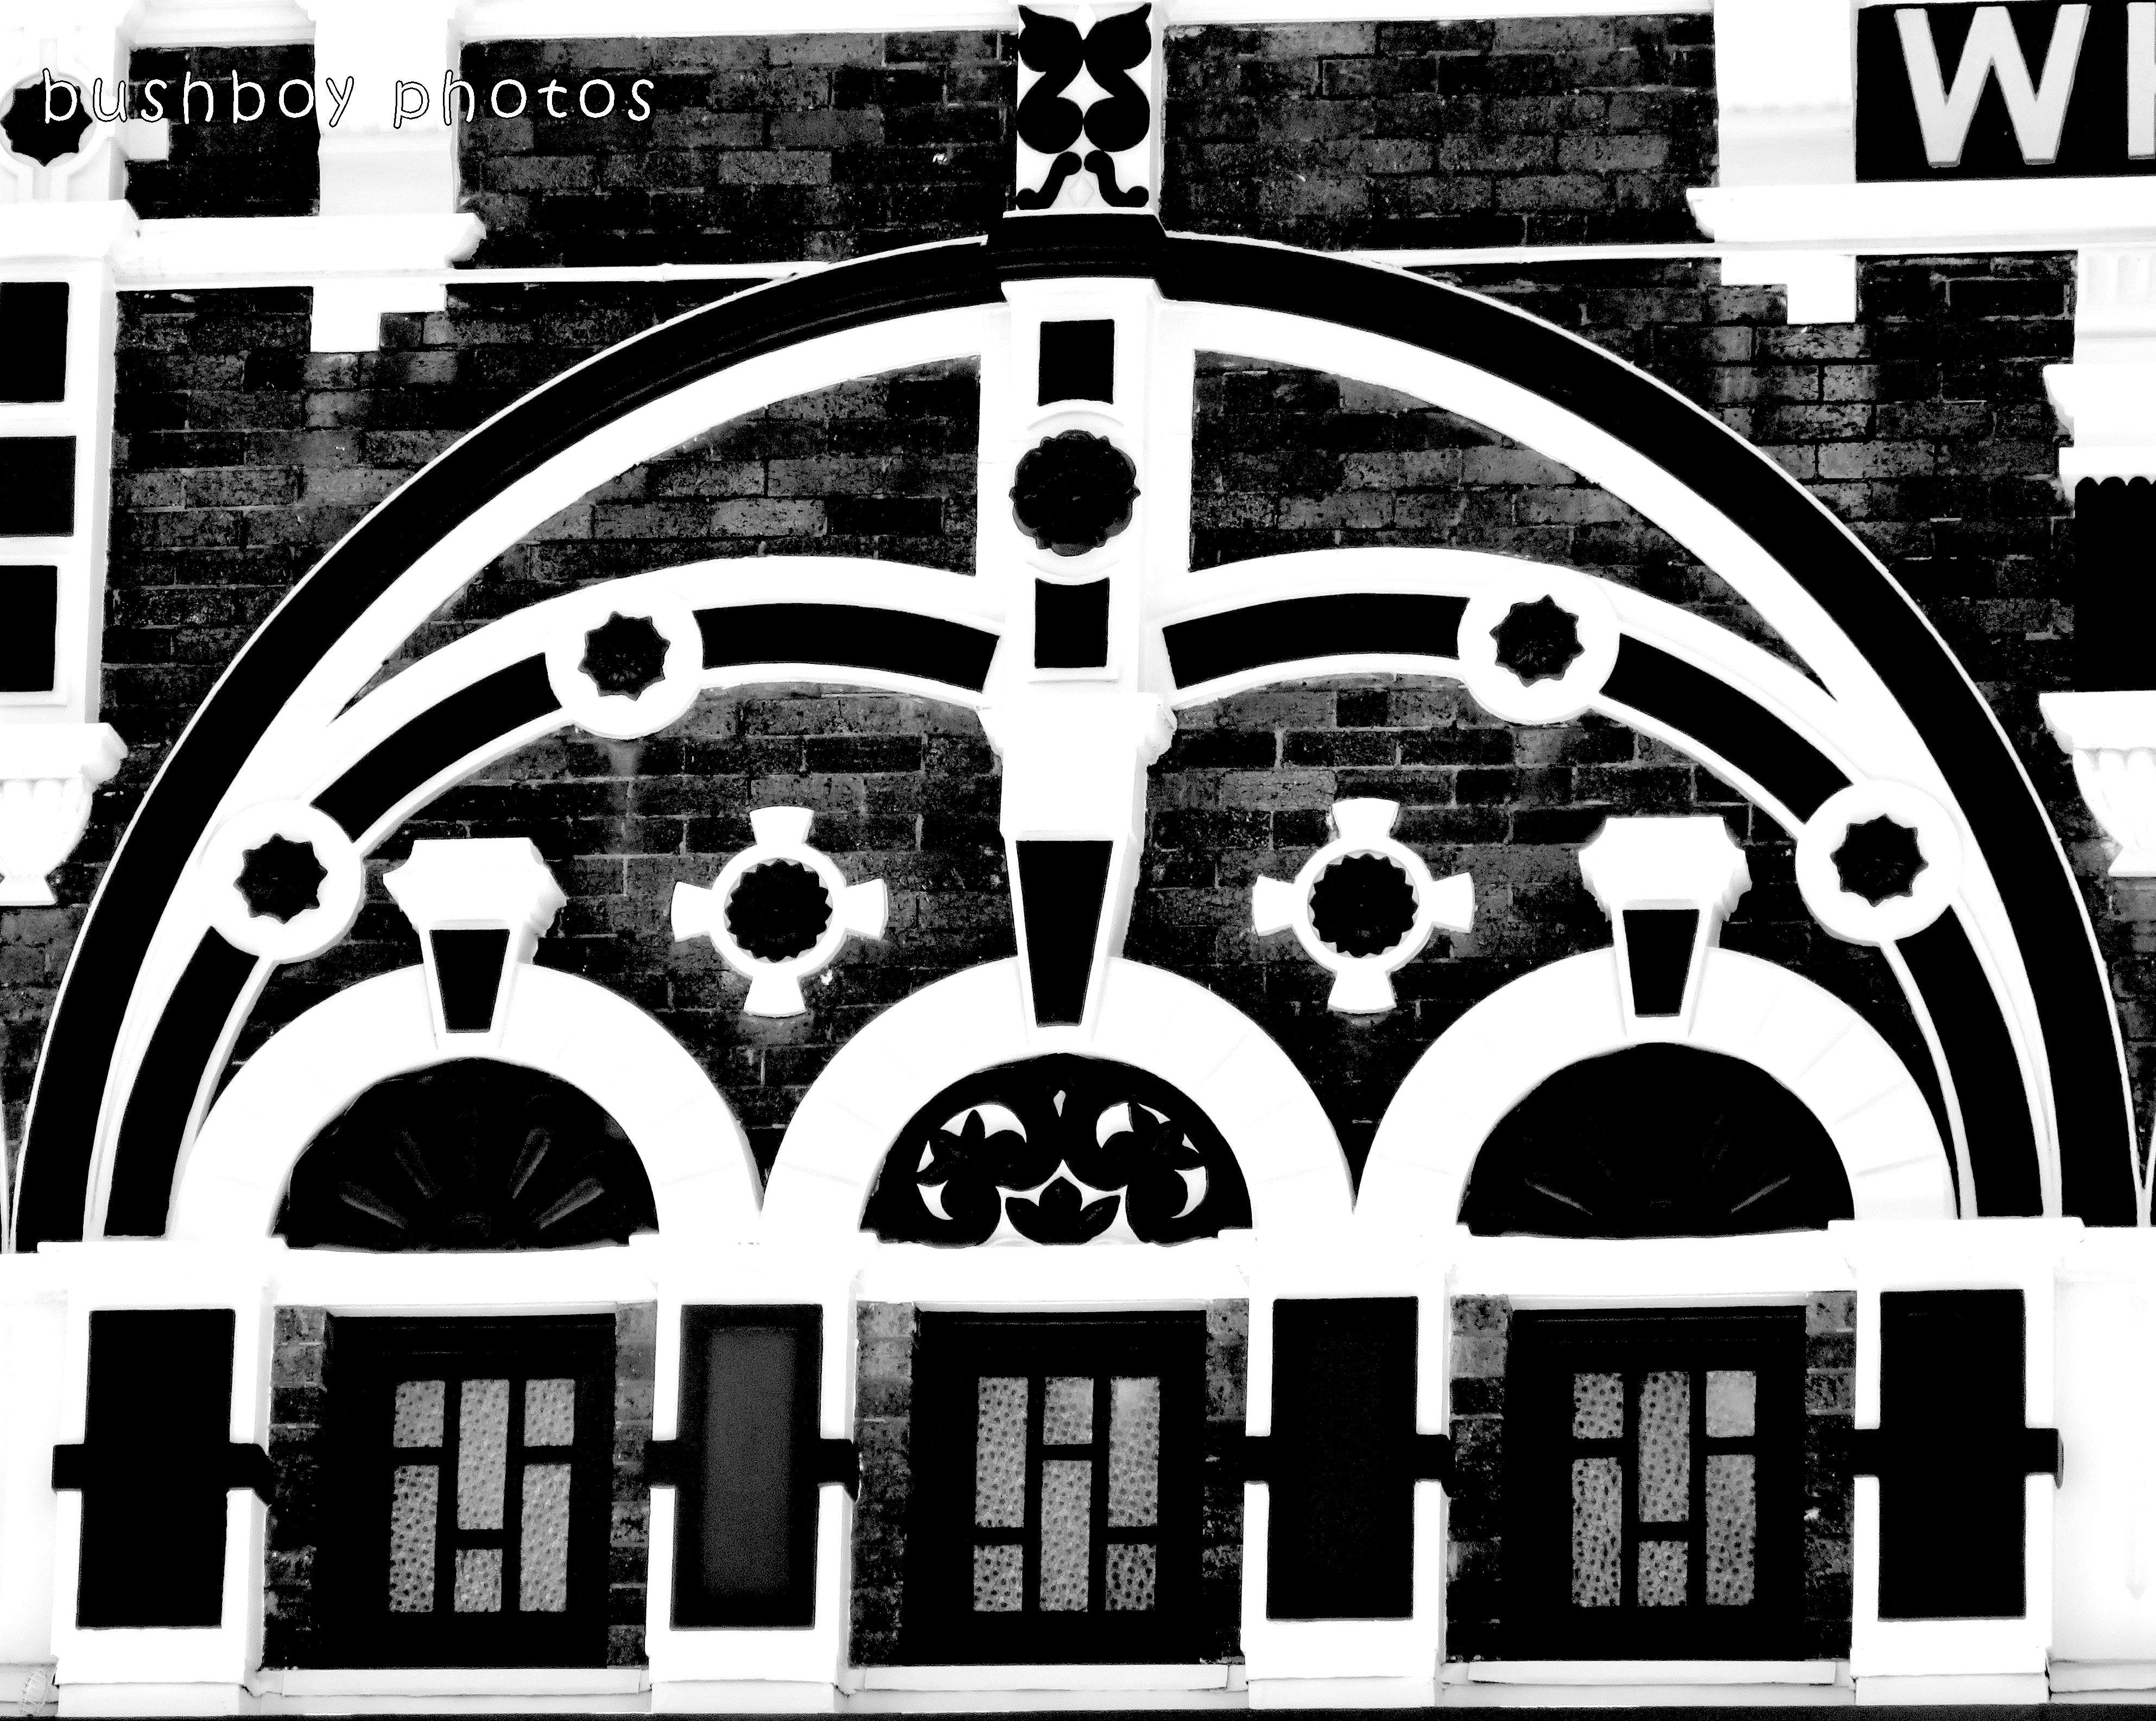 171222_blog challenge_halfcircle_domes_arches_hotel